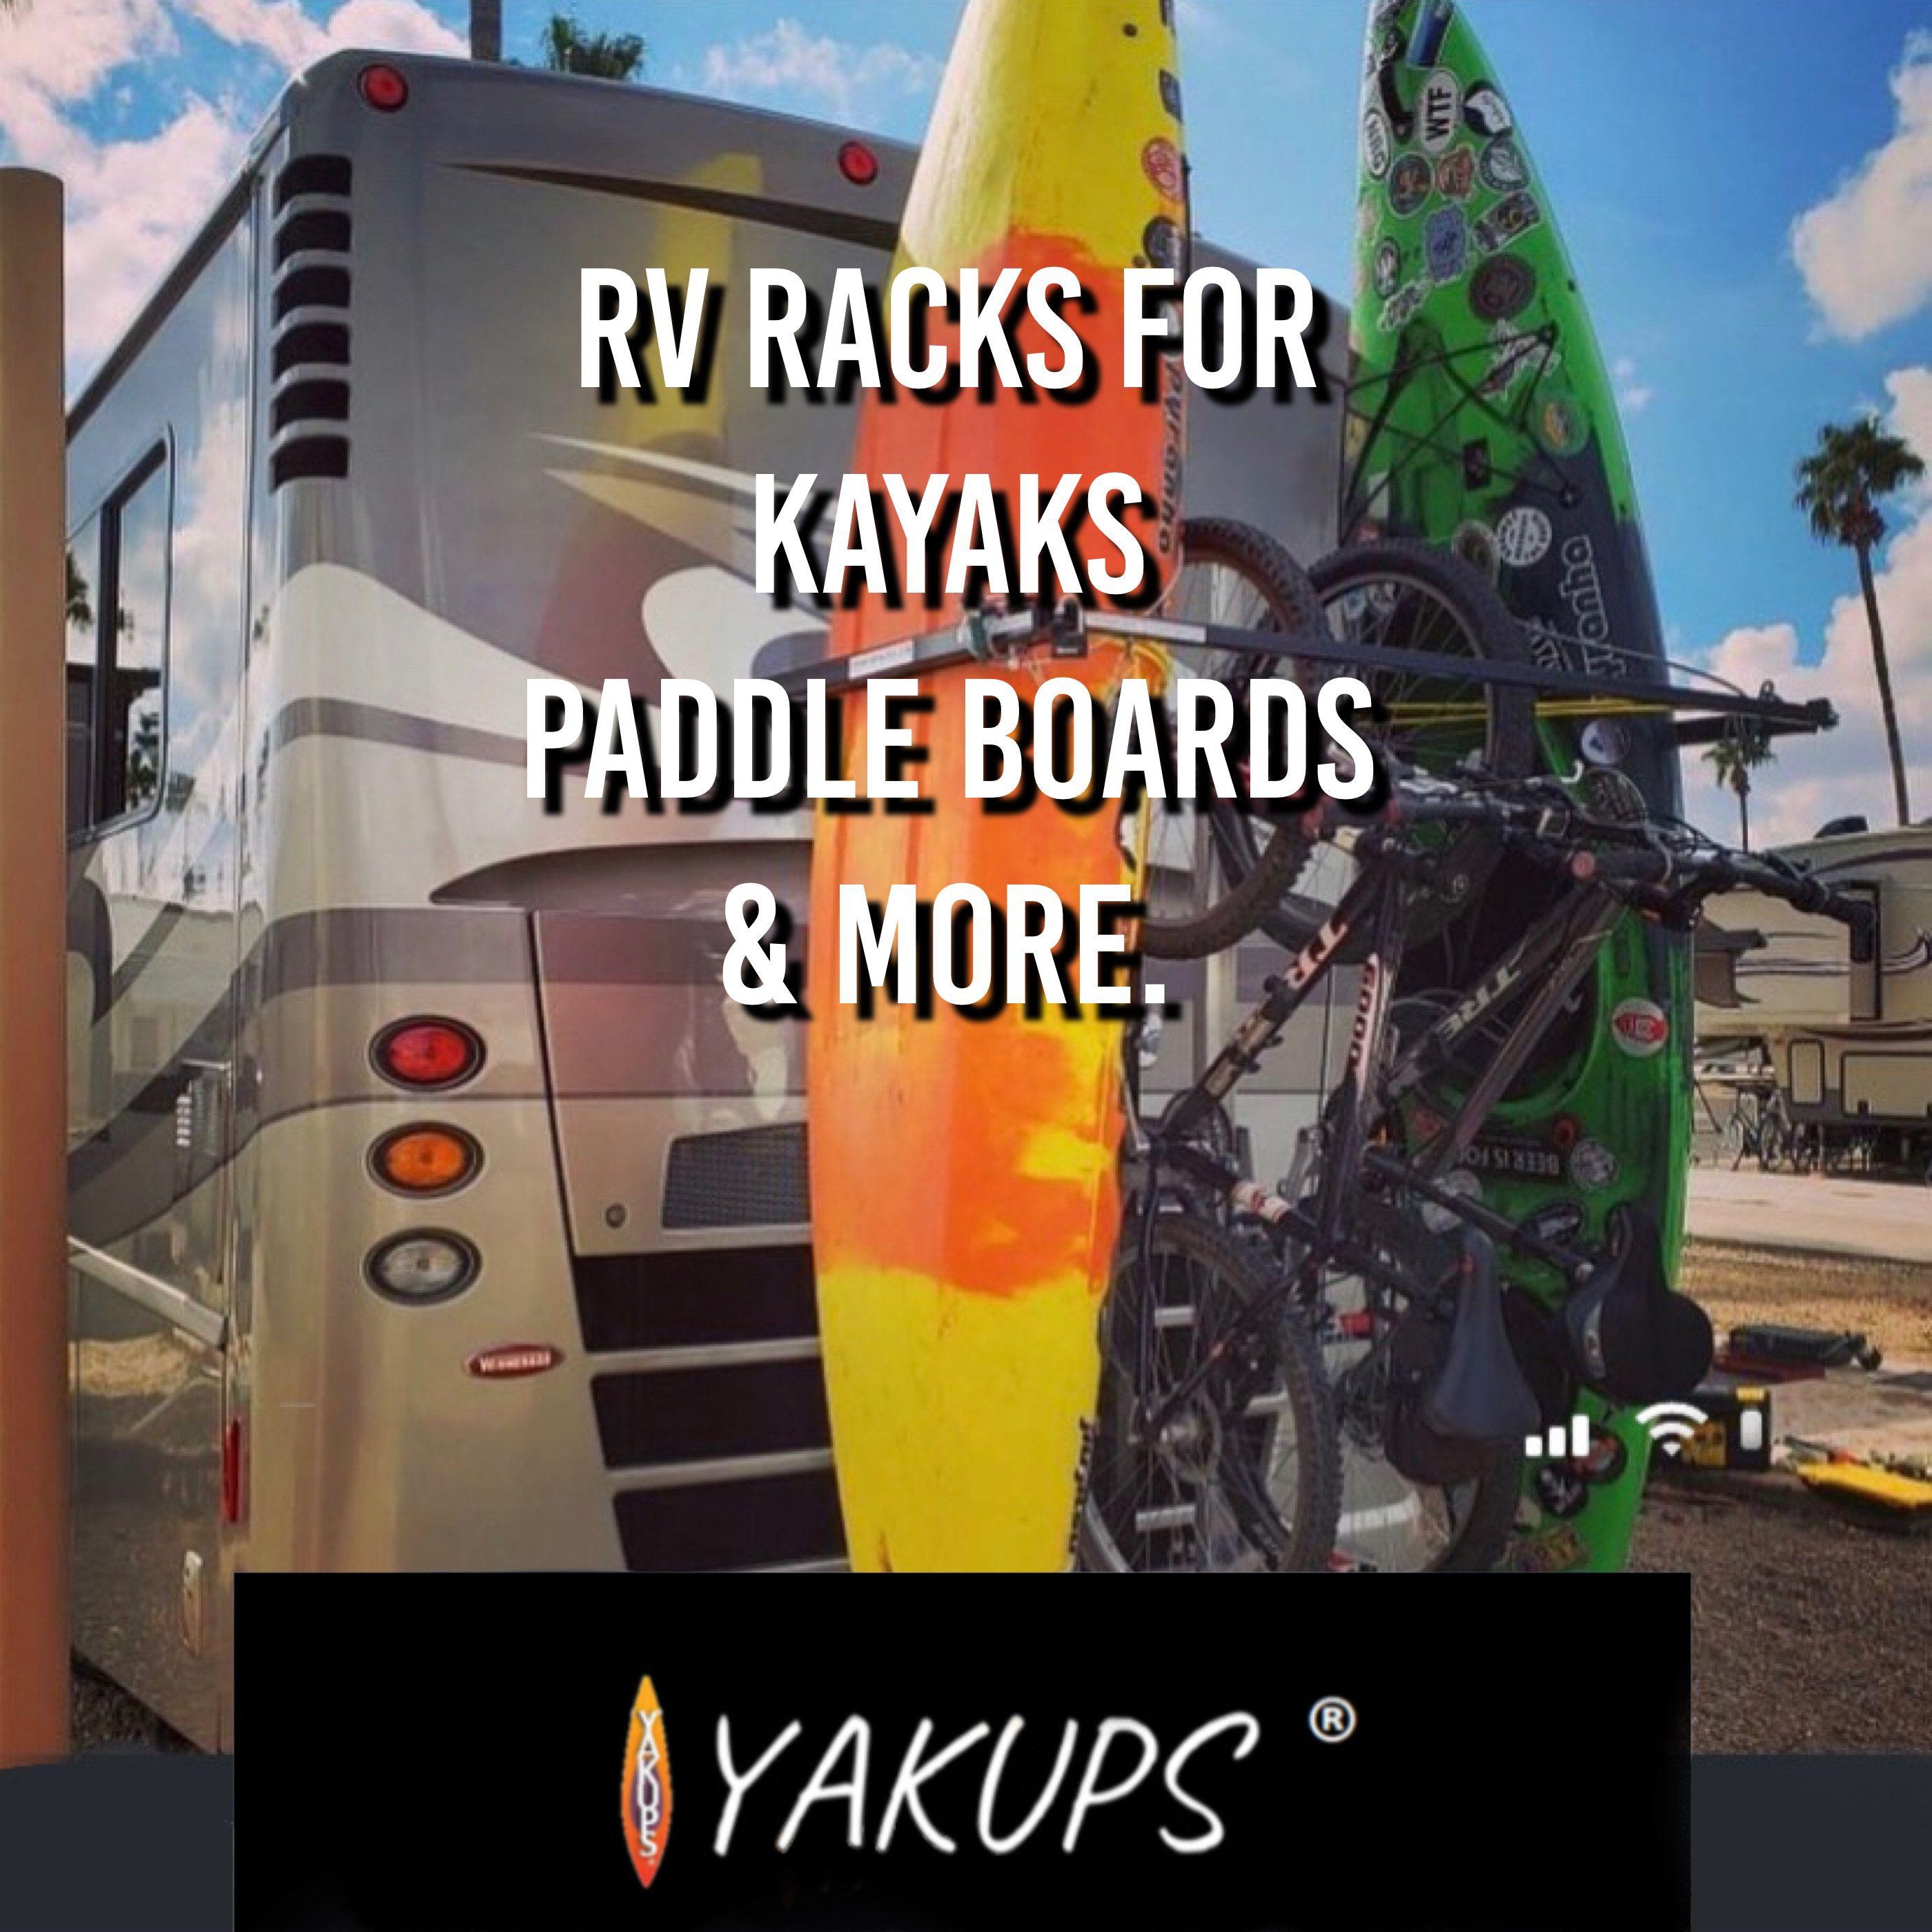 Yakups Rv Rack For Kayaks Paddle Boards More In 2020 Travel Trailer Camping Camping Rv Living Kayaking